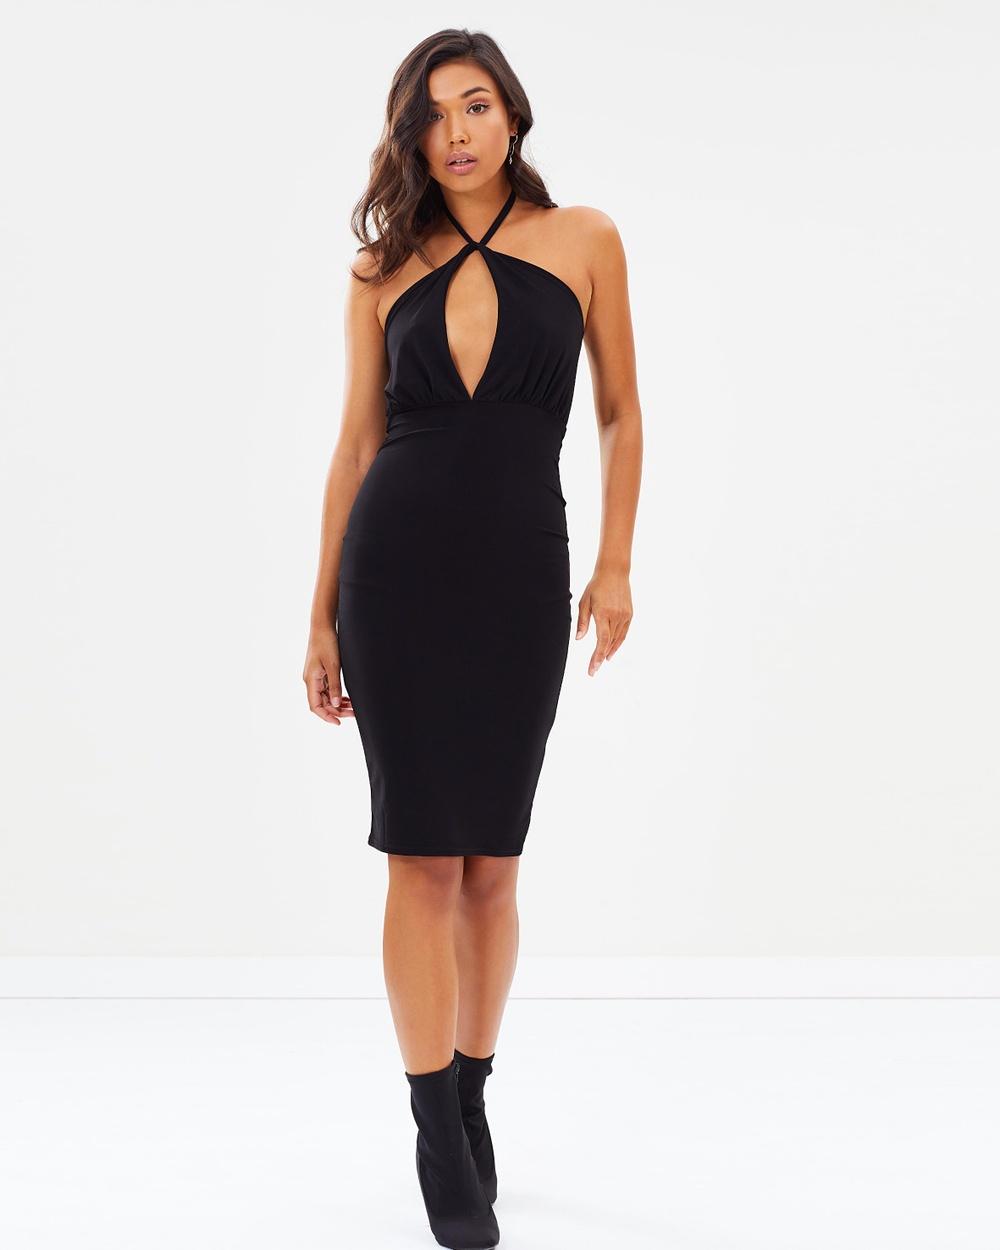 Missguided Slinky Tie Neck Twist Keyhole Midi Dress Bodycon Dresses Black Slinky Tie-Neck Twist Keyhole Midi Dress